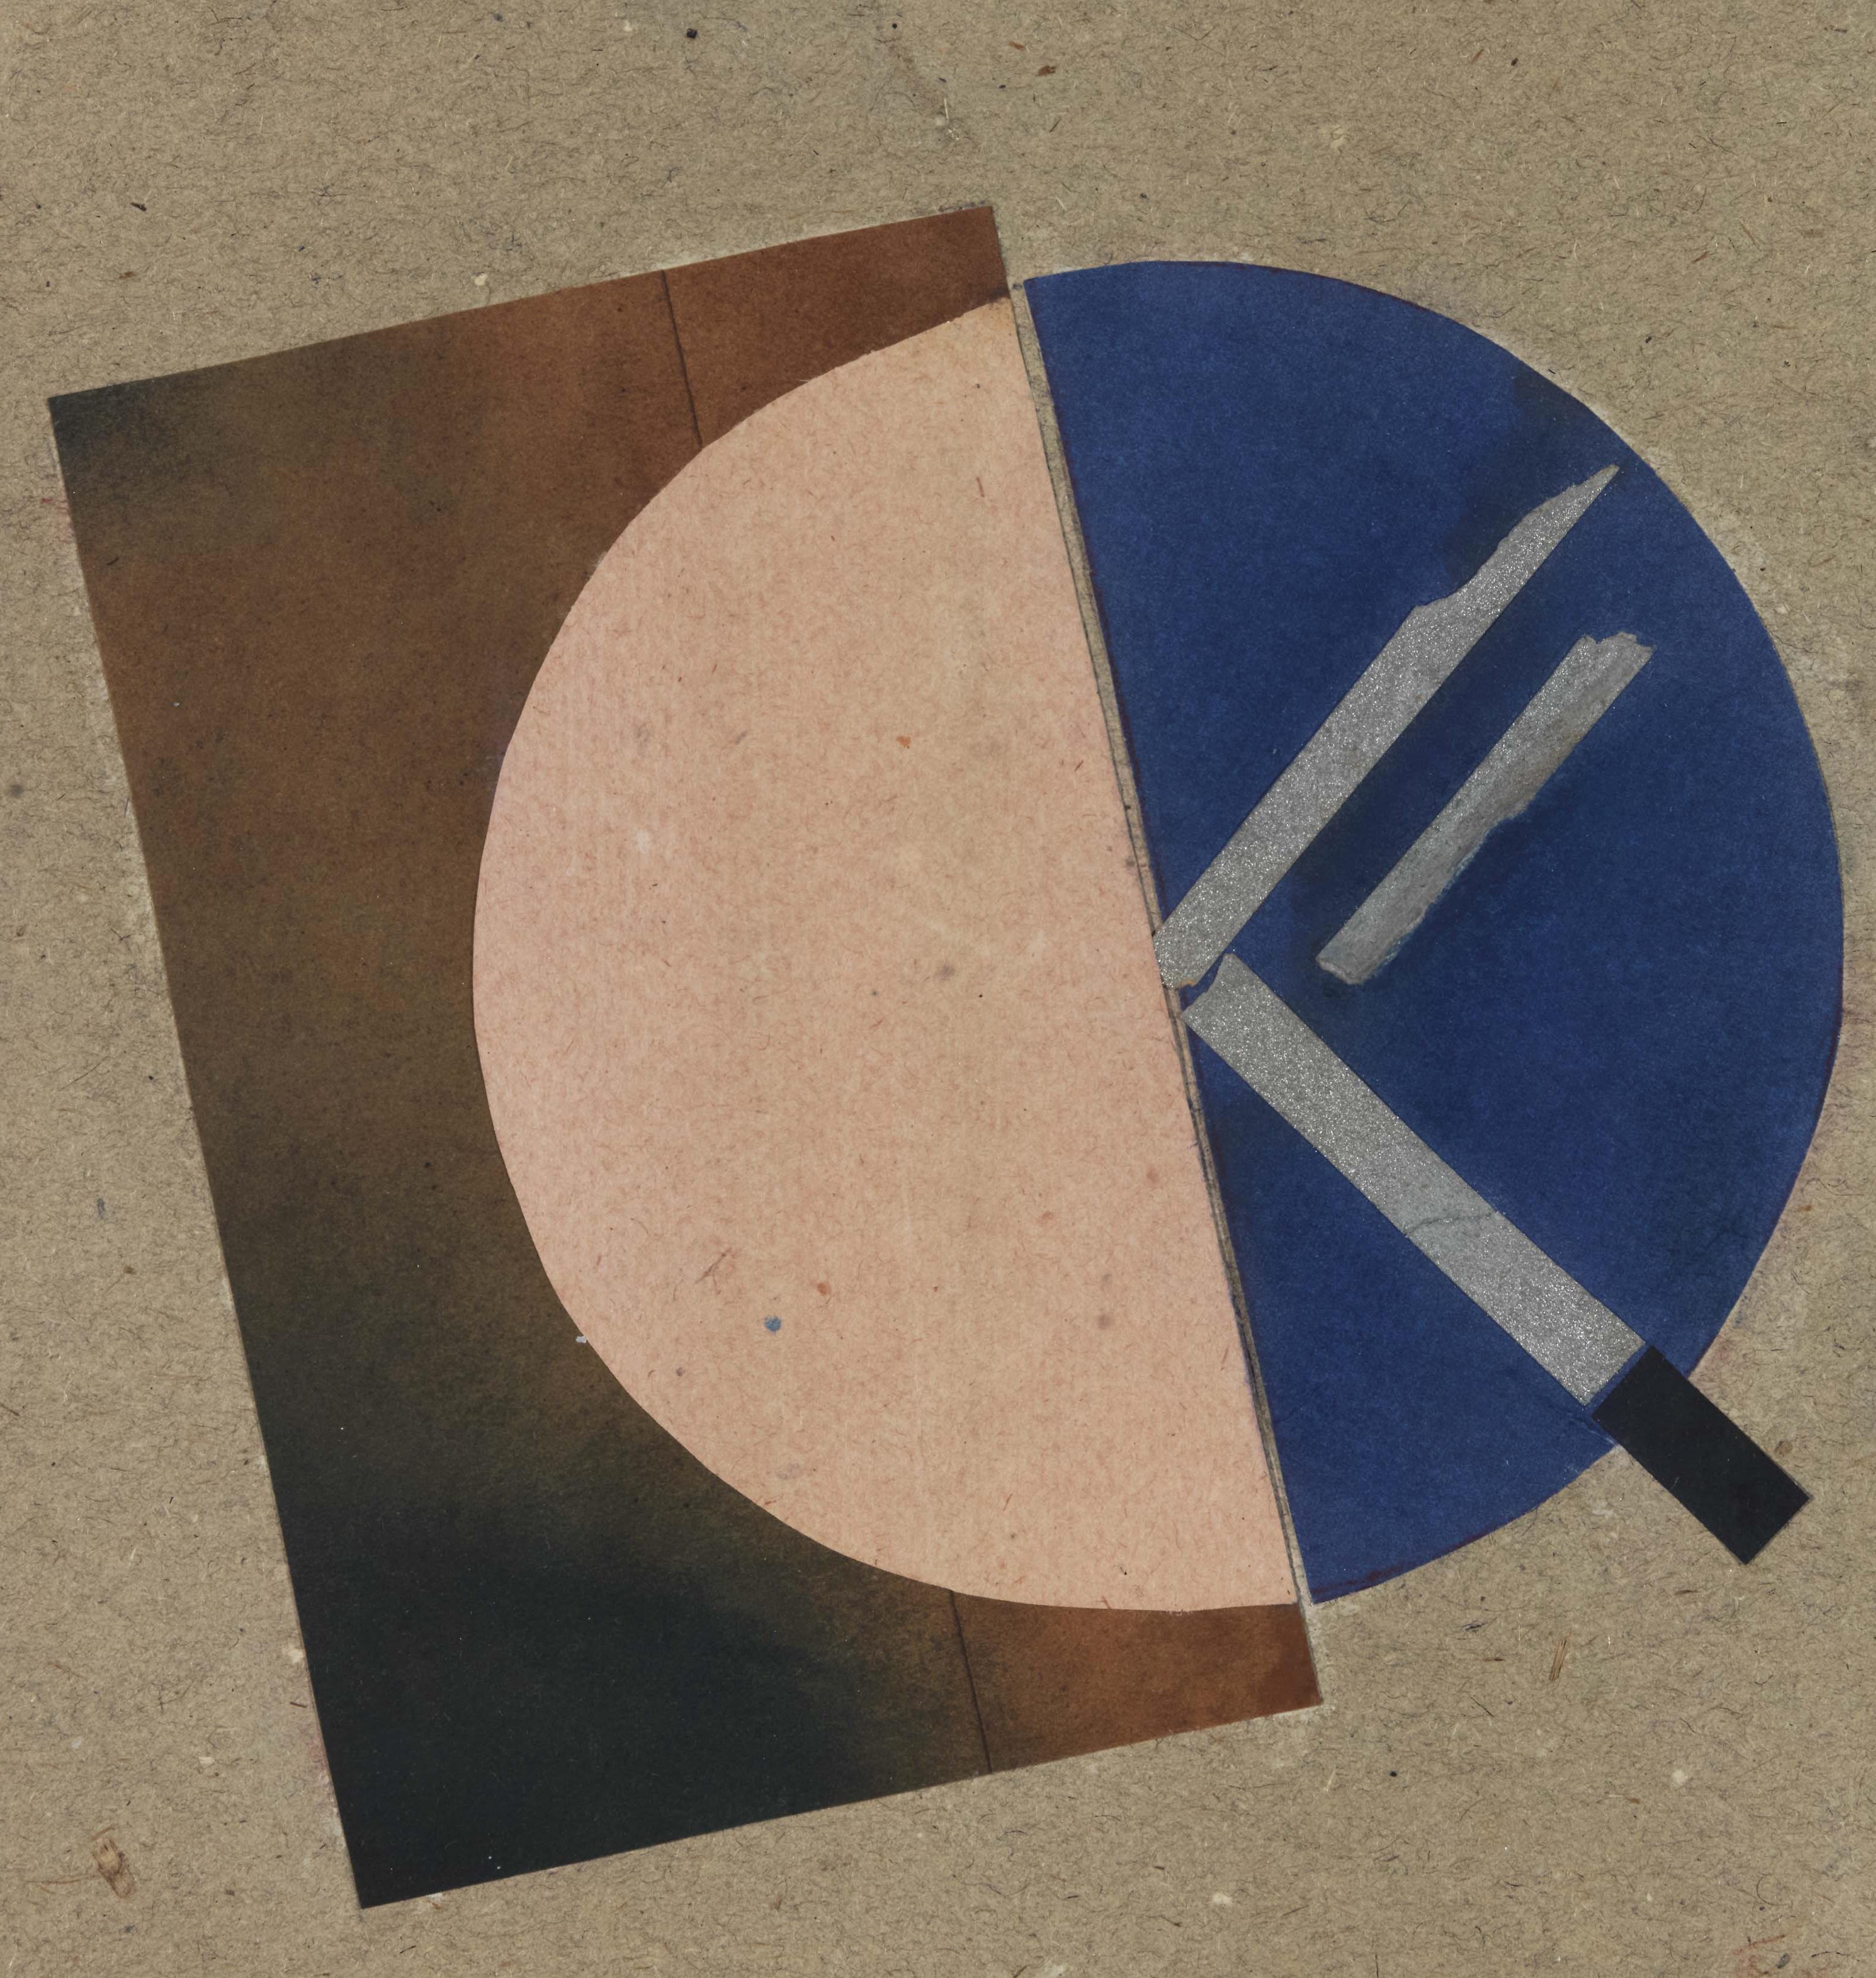 Suprematist composition, 1921 - Boris Kosarev